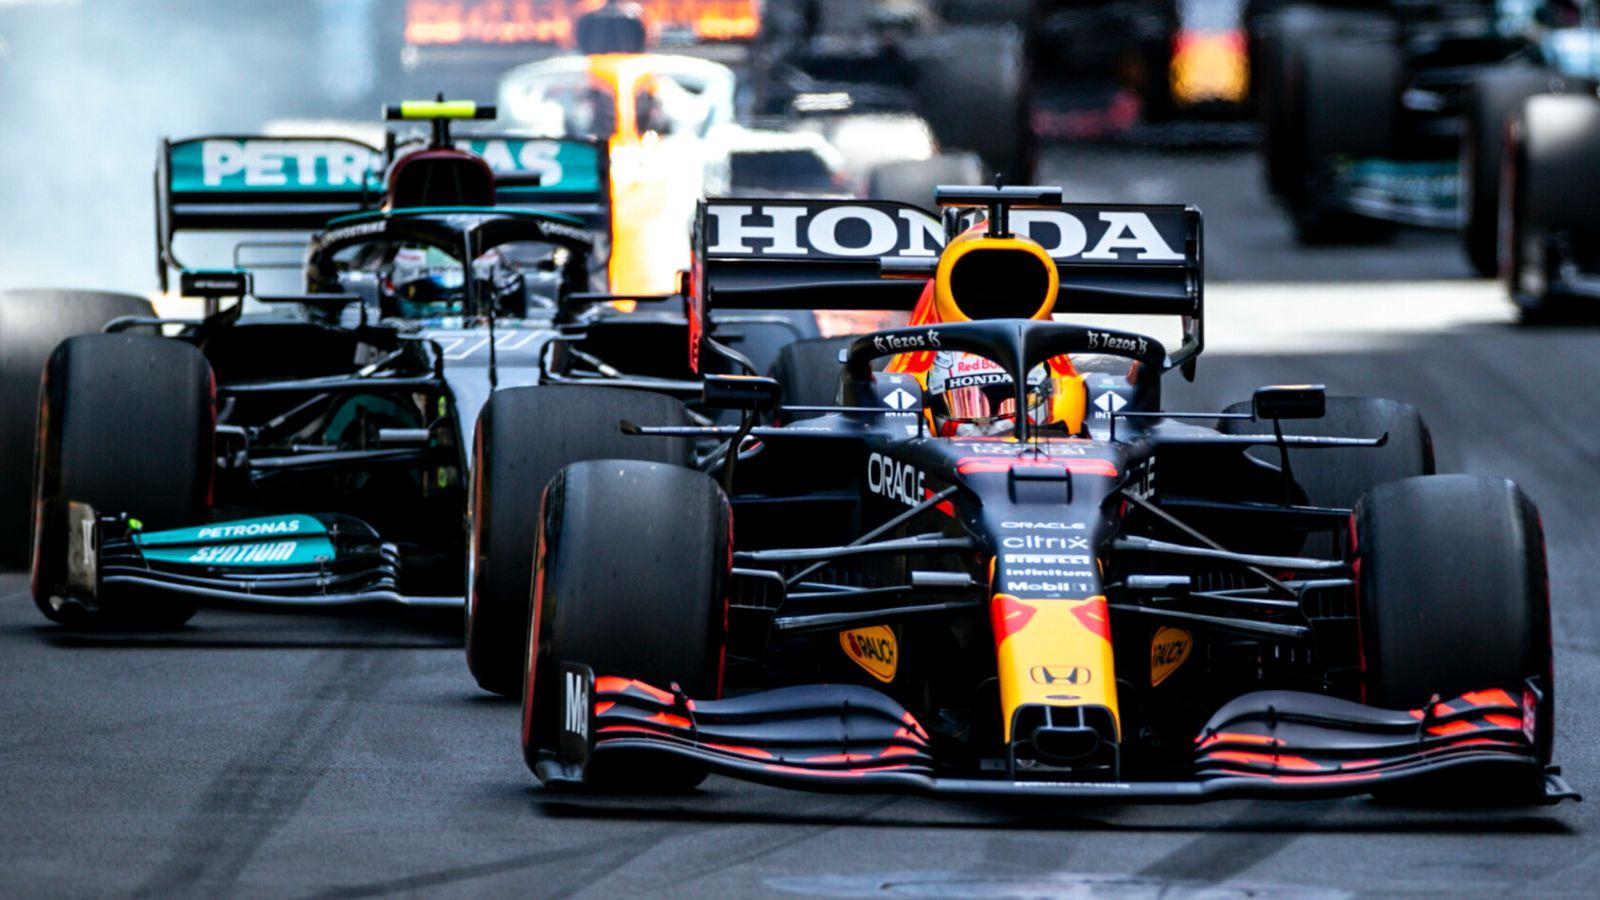 Azerbaijan GP: New F1 title leaders Red Bull predict Mercedes resurgence in Baku after Monaco turnaround   F1 News